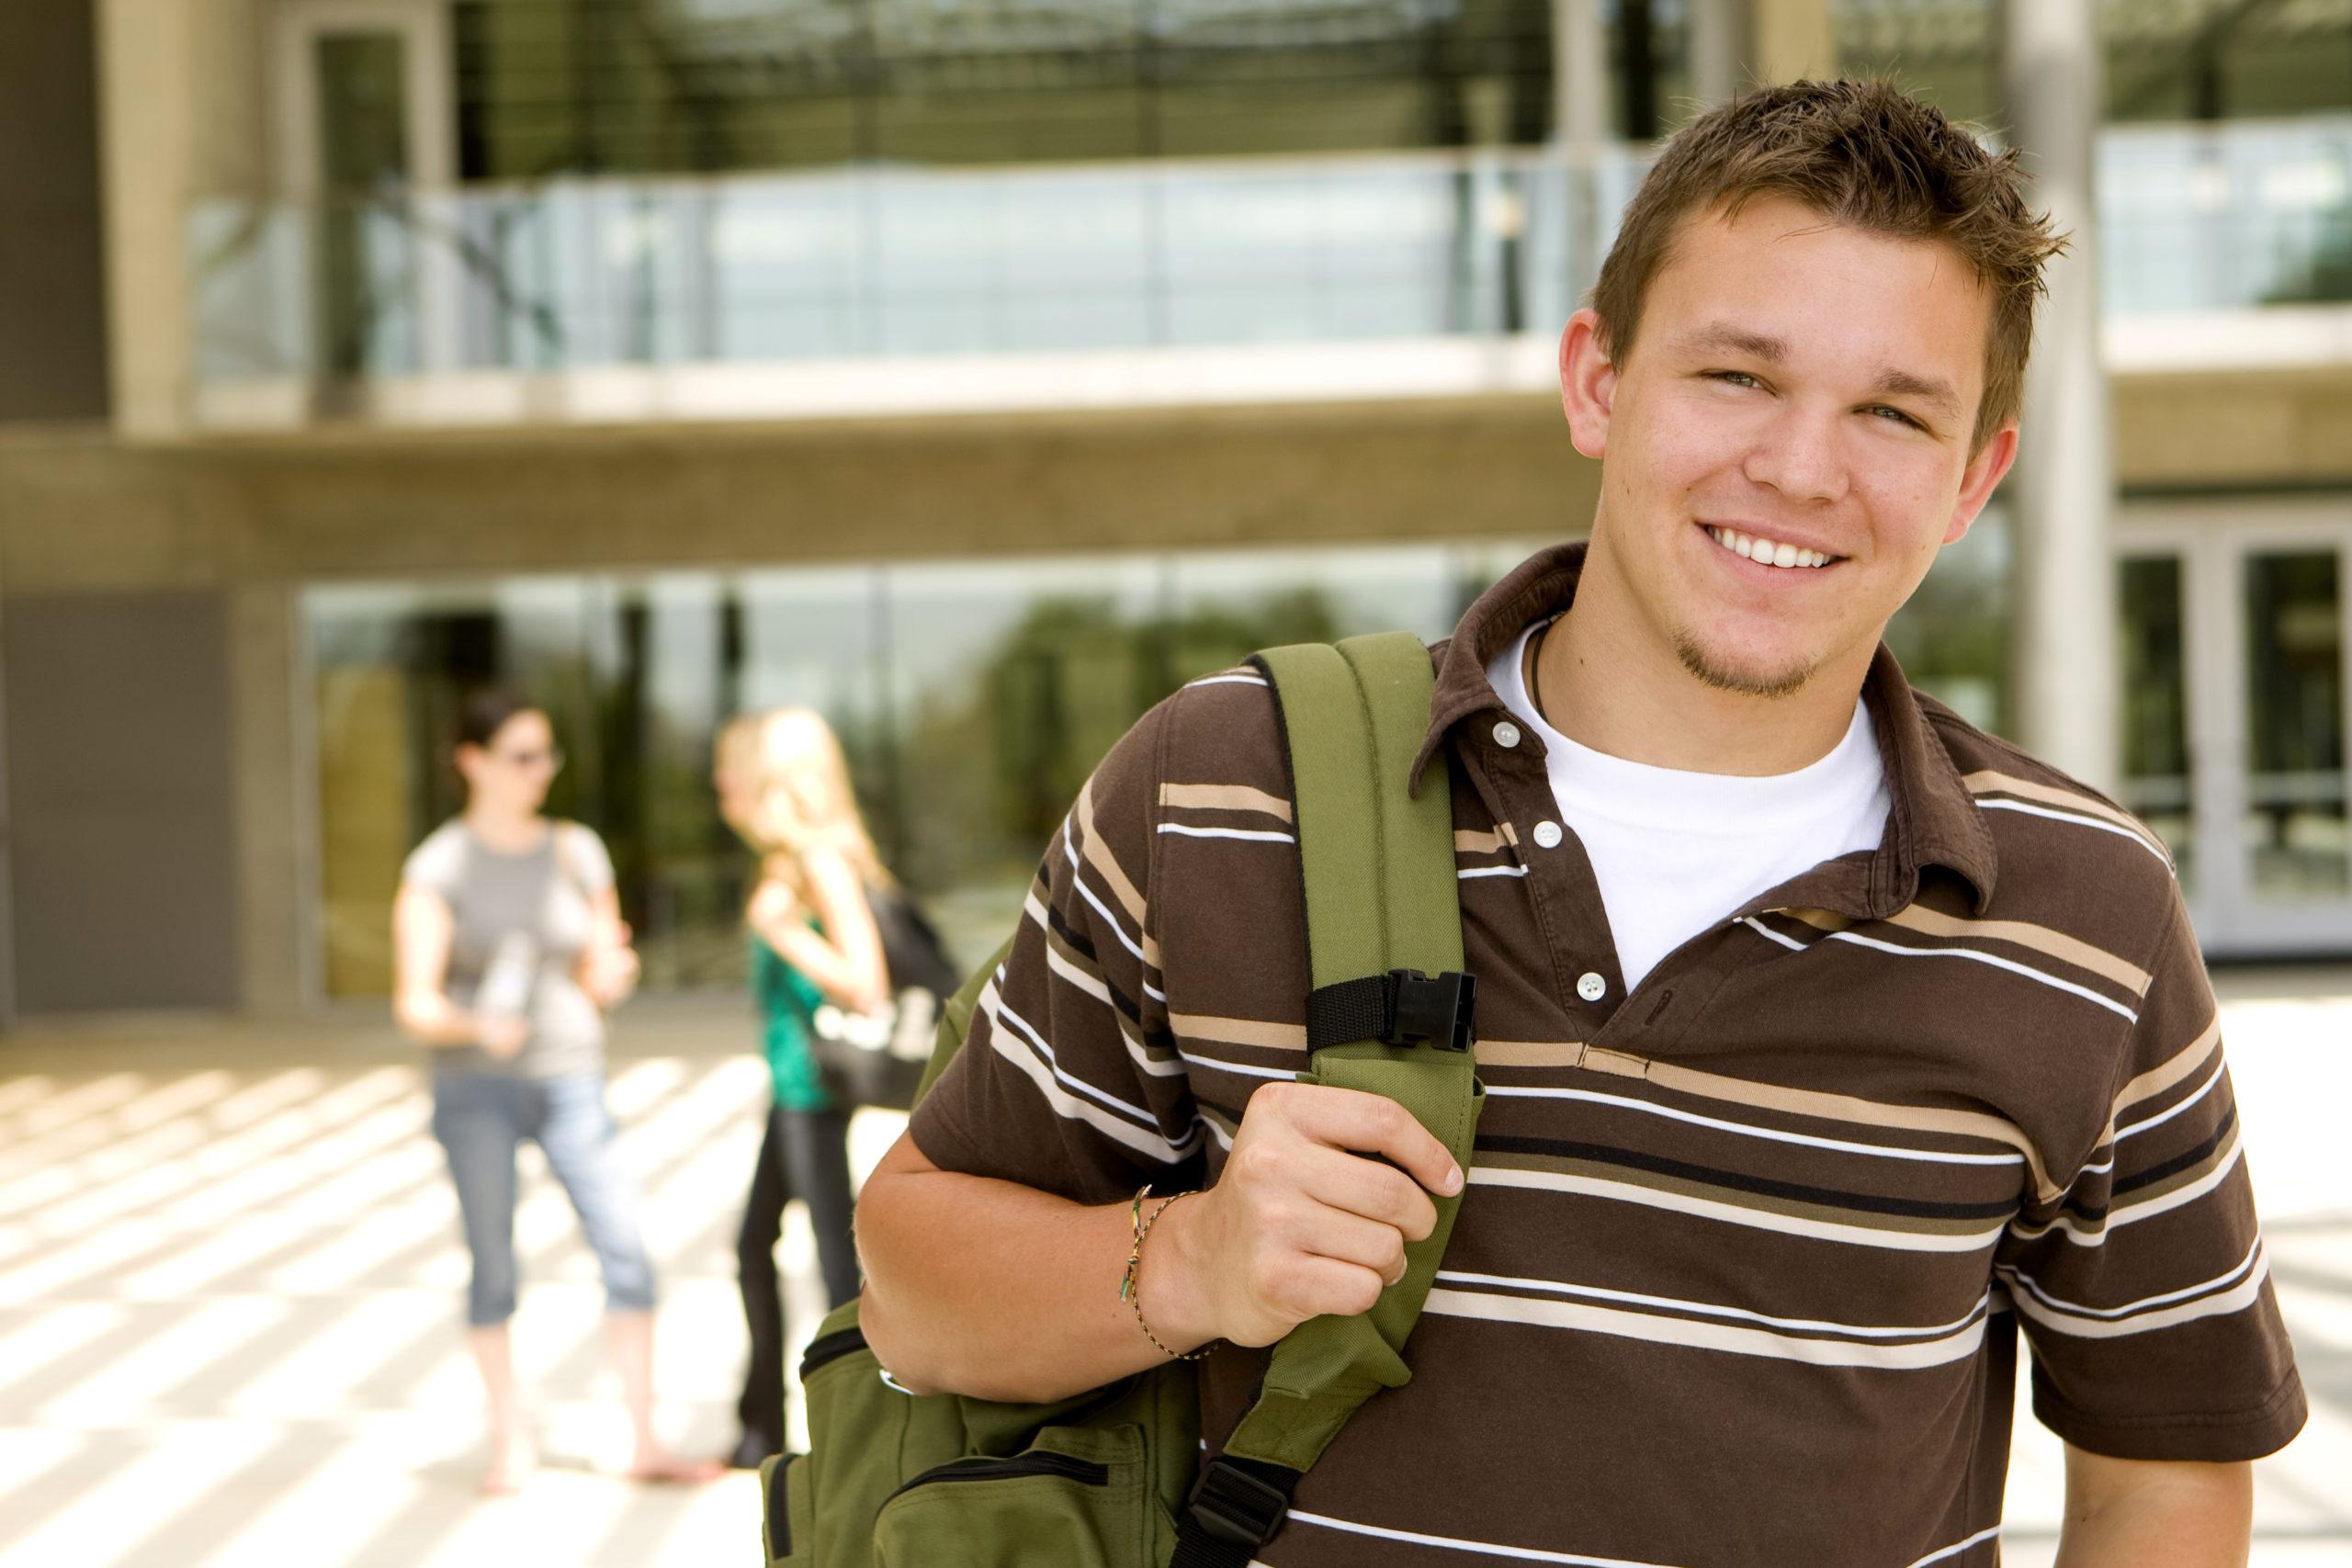 Young Man At School